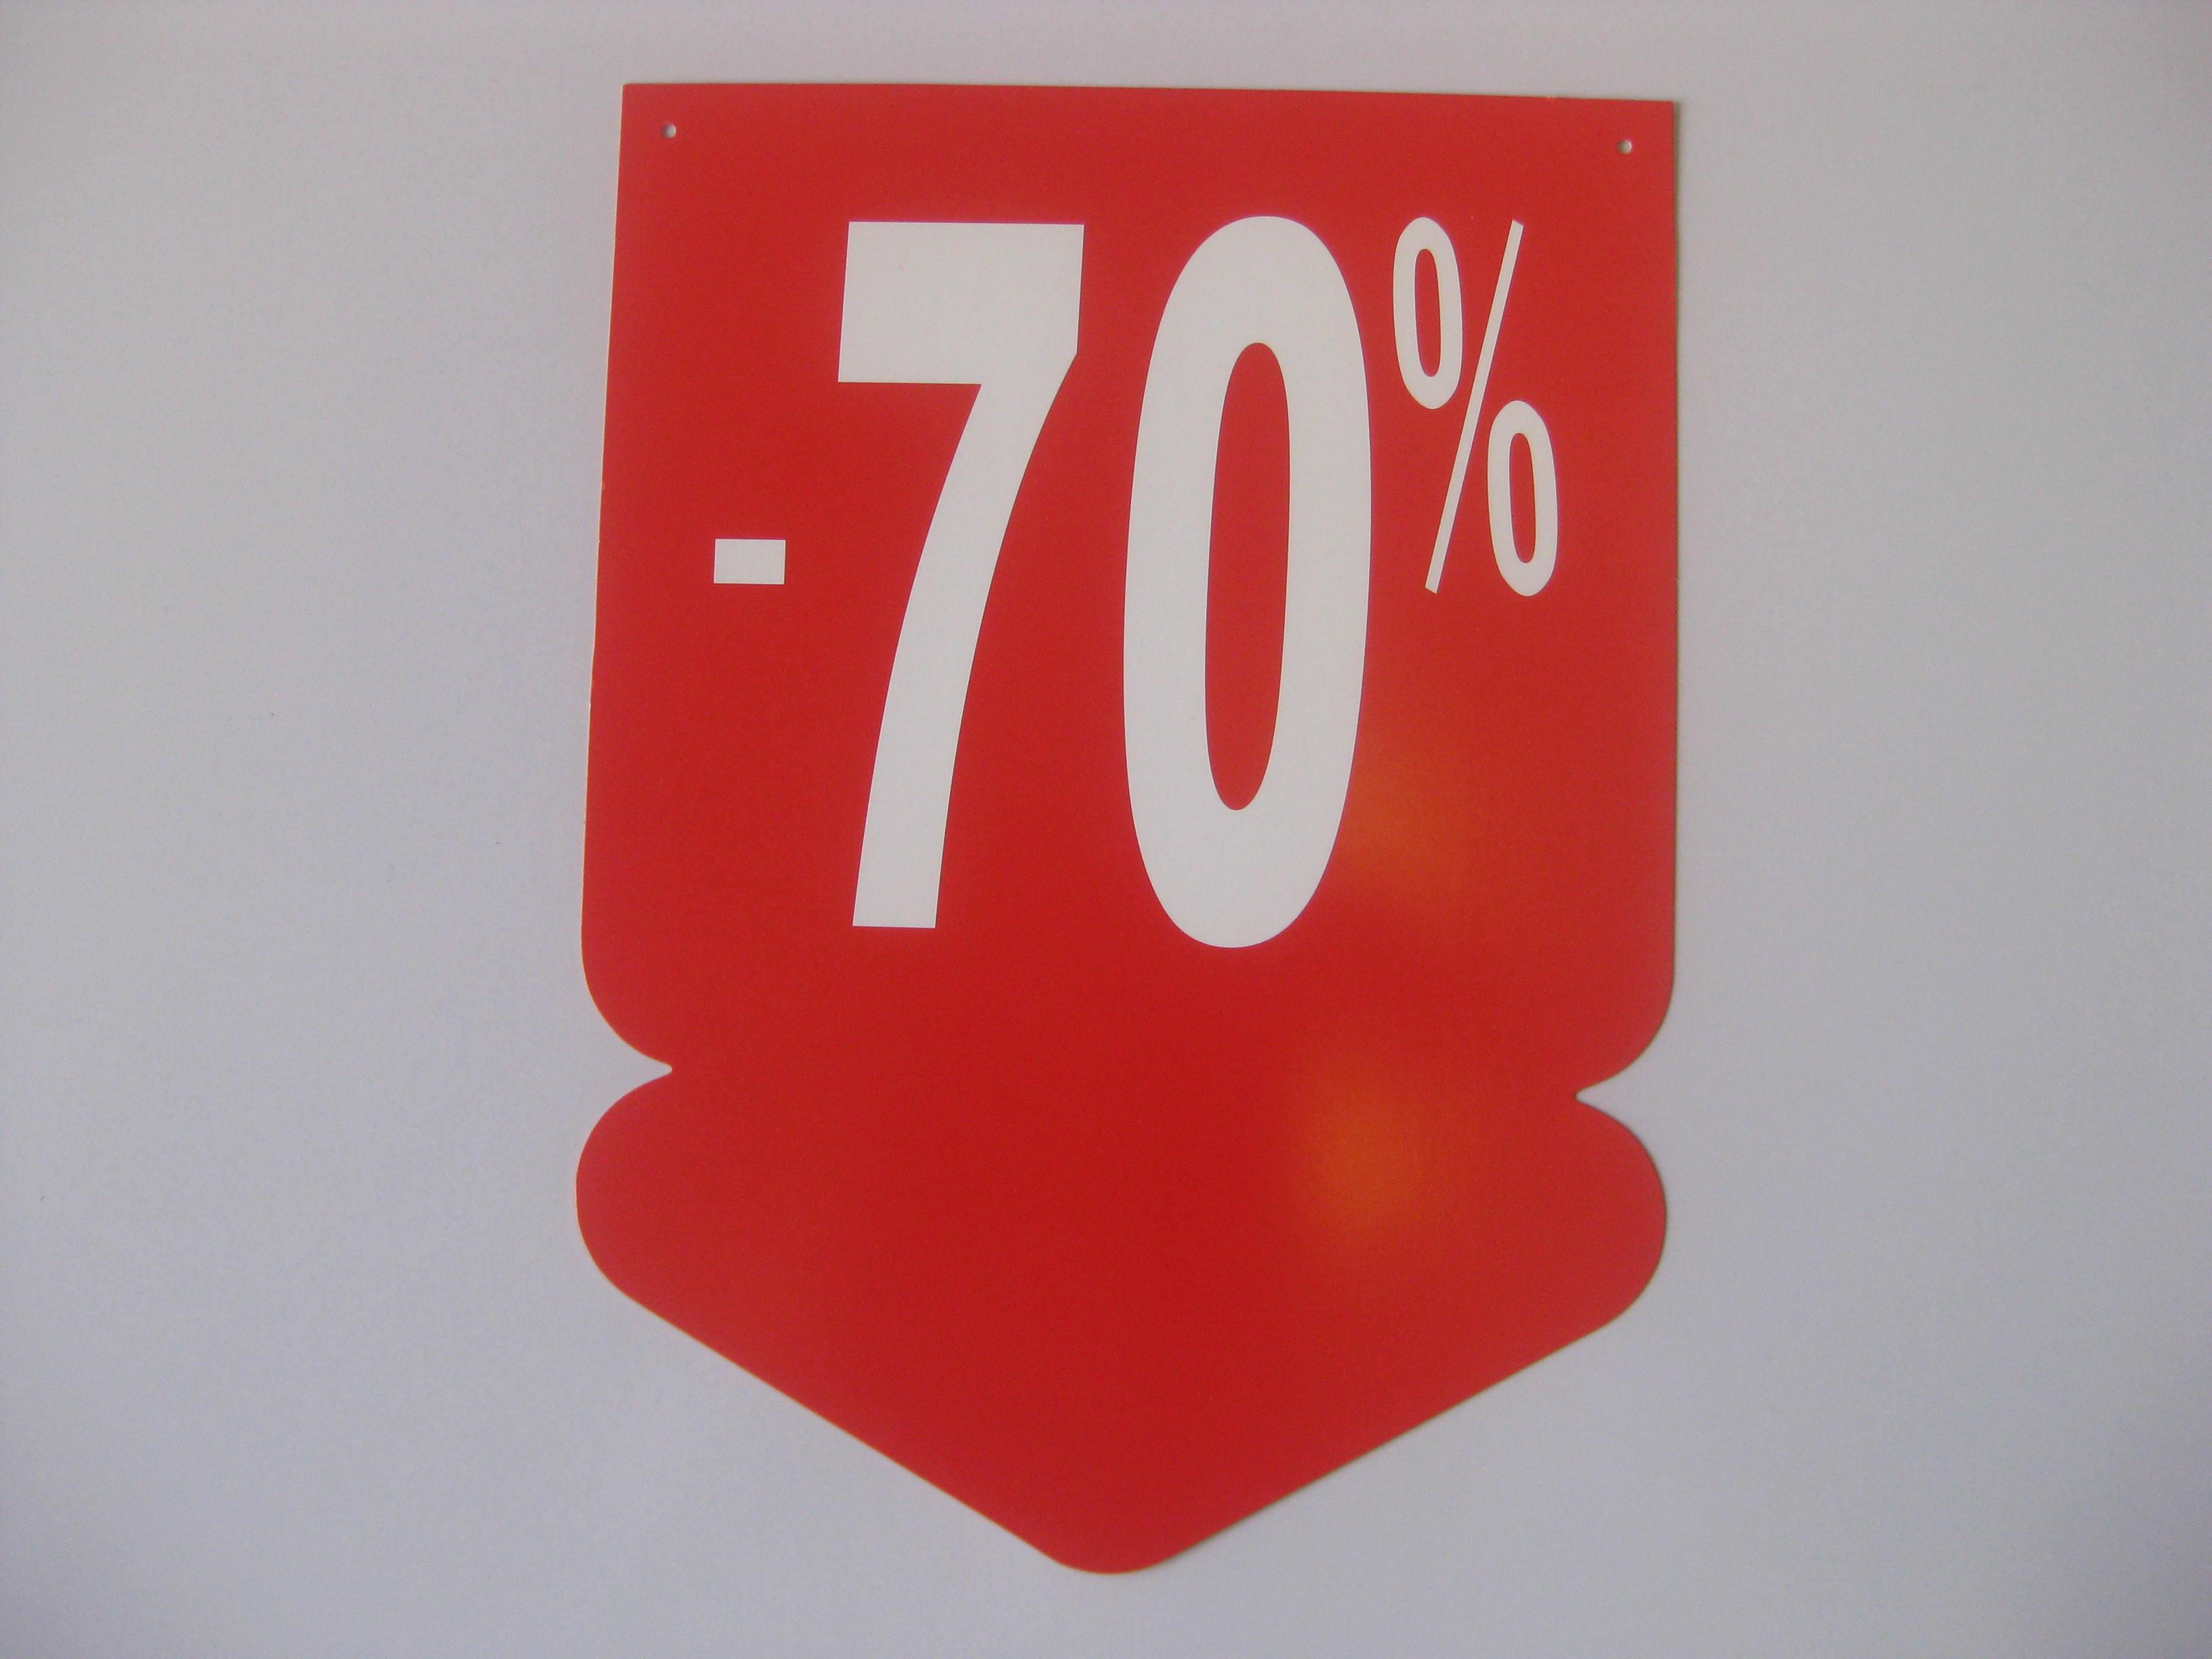 Detail produktu visačky šípka -70%velikost 24x33cm.